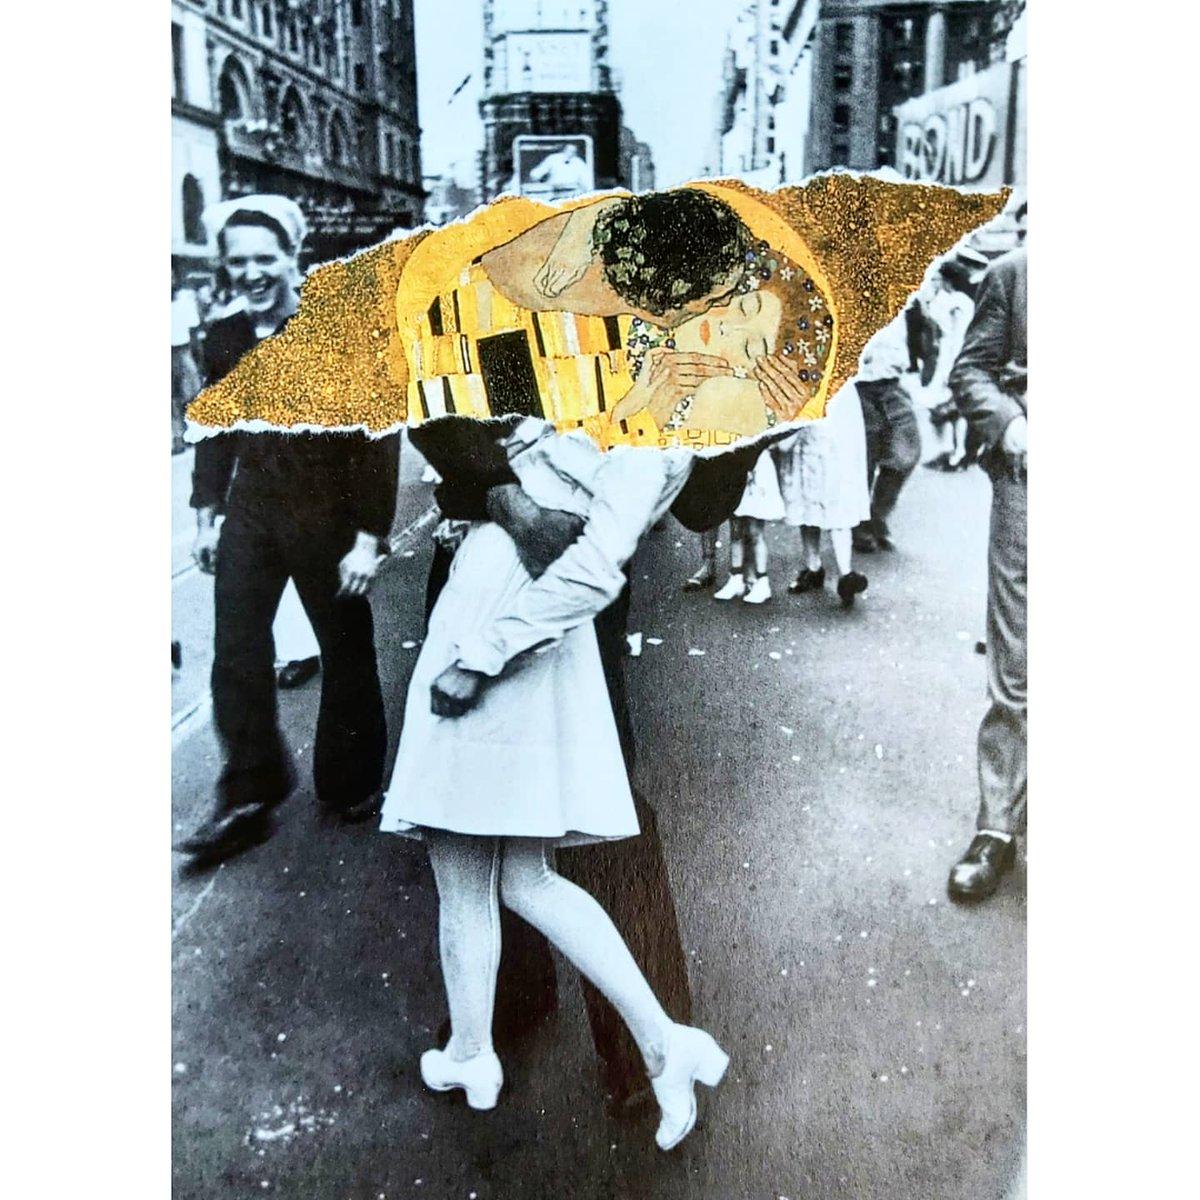 Just Kiss | Nomadecollage | analogcollage | socialcollage | propagandapapel | activistapapel  #collage #collageart #collagework #analogcollage #cutandpaste #collageartwork #handmade #painting #klimt #KISSINMYLIPS #FelizMartes https://t.co/4nmVanNzXm